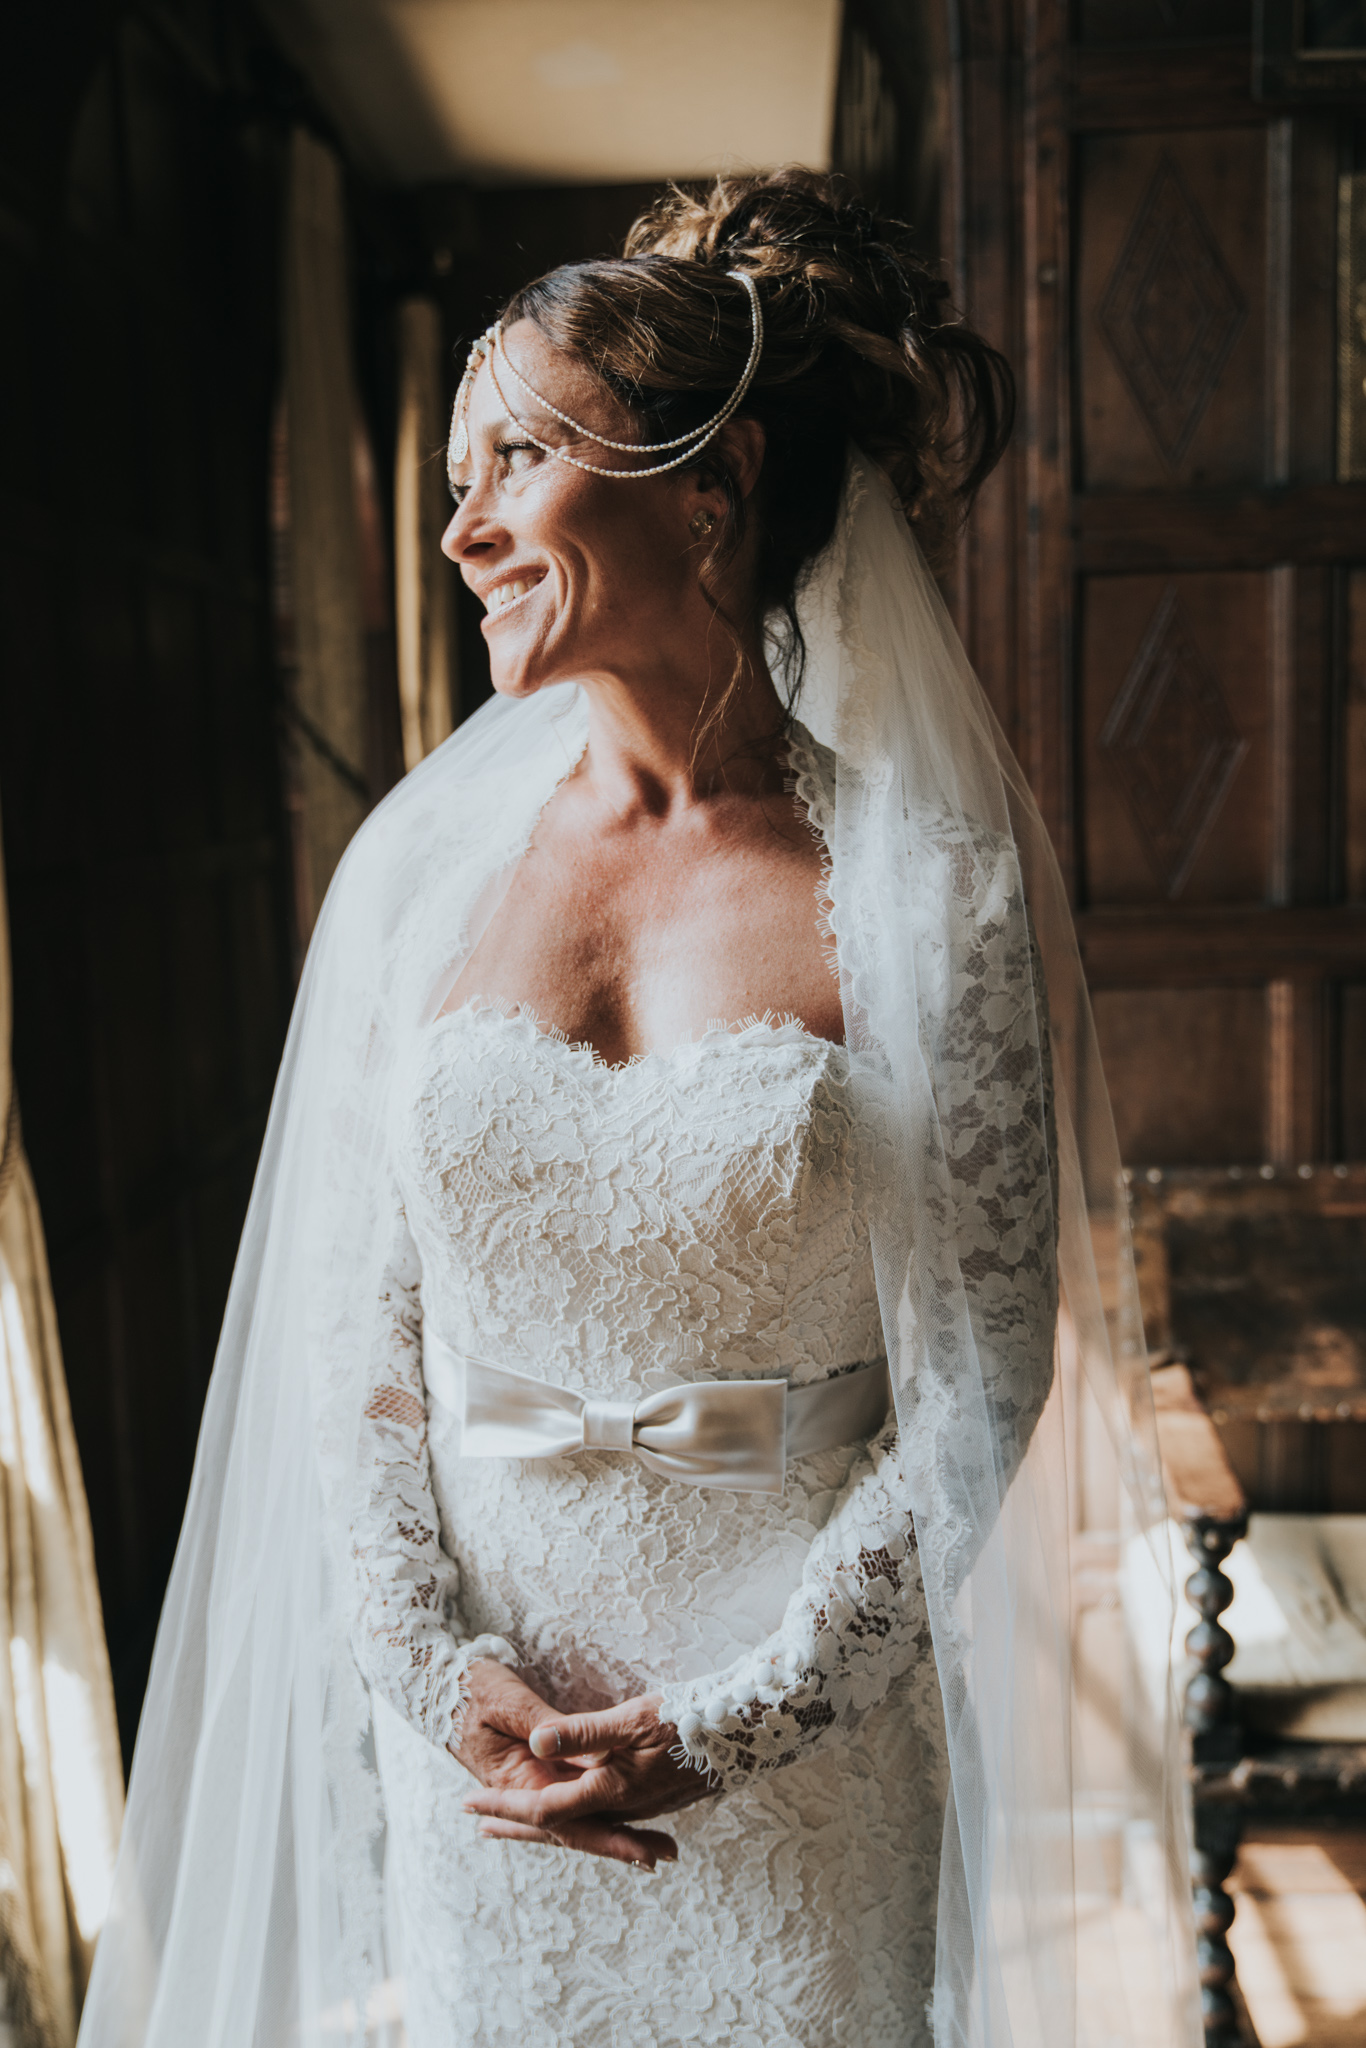 grace-elizabeth-boho-wedding-headingham-castle-essex-wedding-photographer-16.jpg